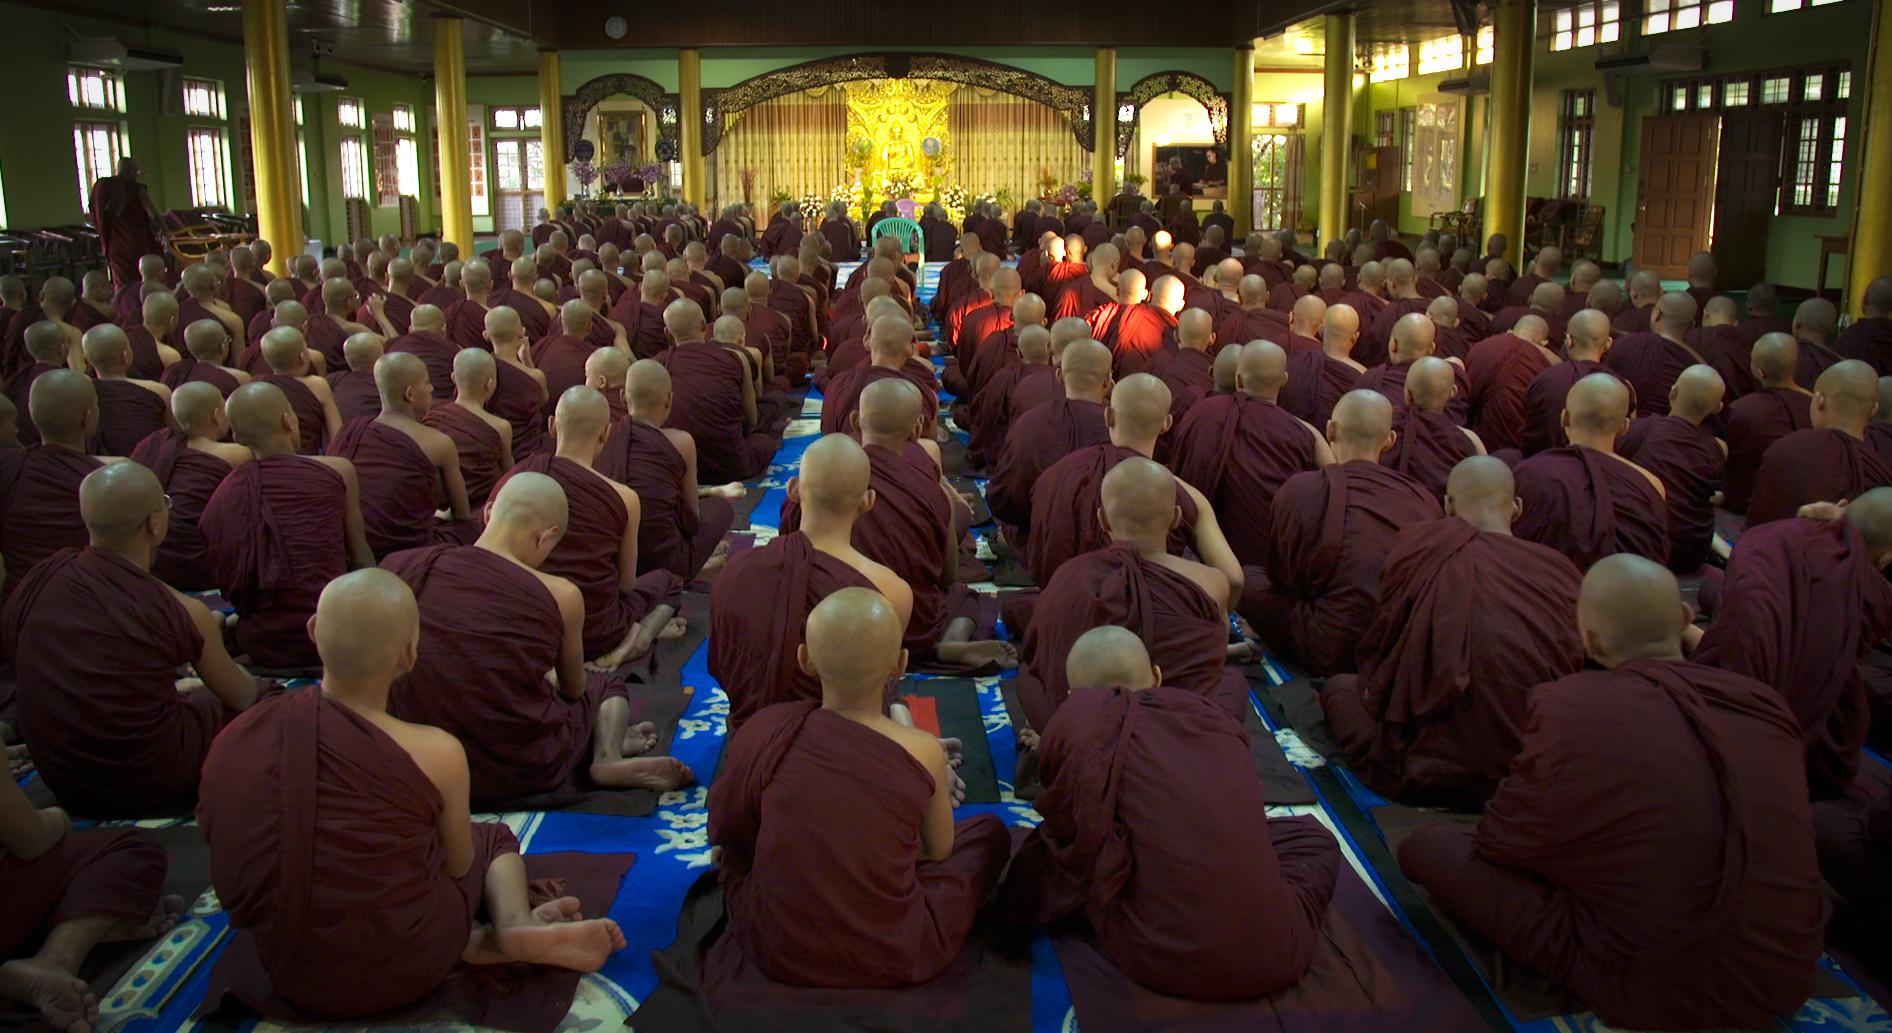 Priere moines